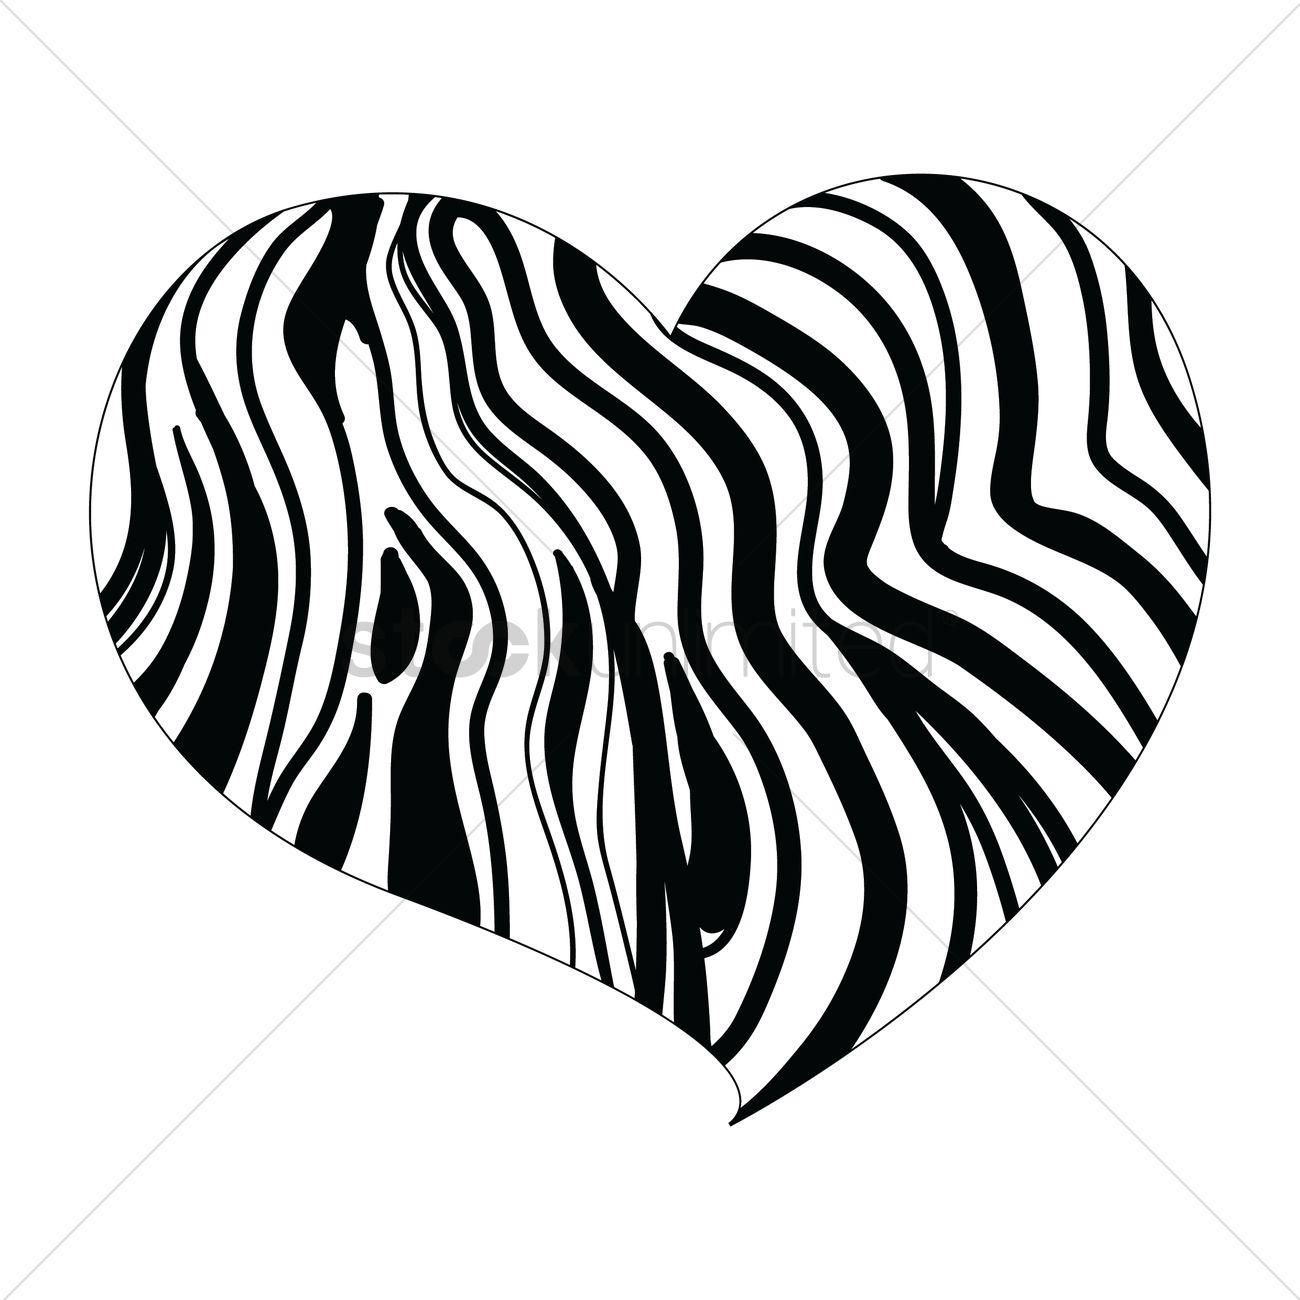 1300x1300 Heart Design With Zebra Print Vector Image